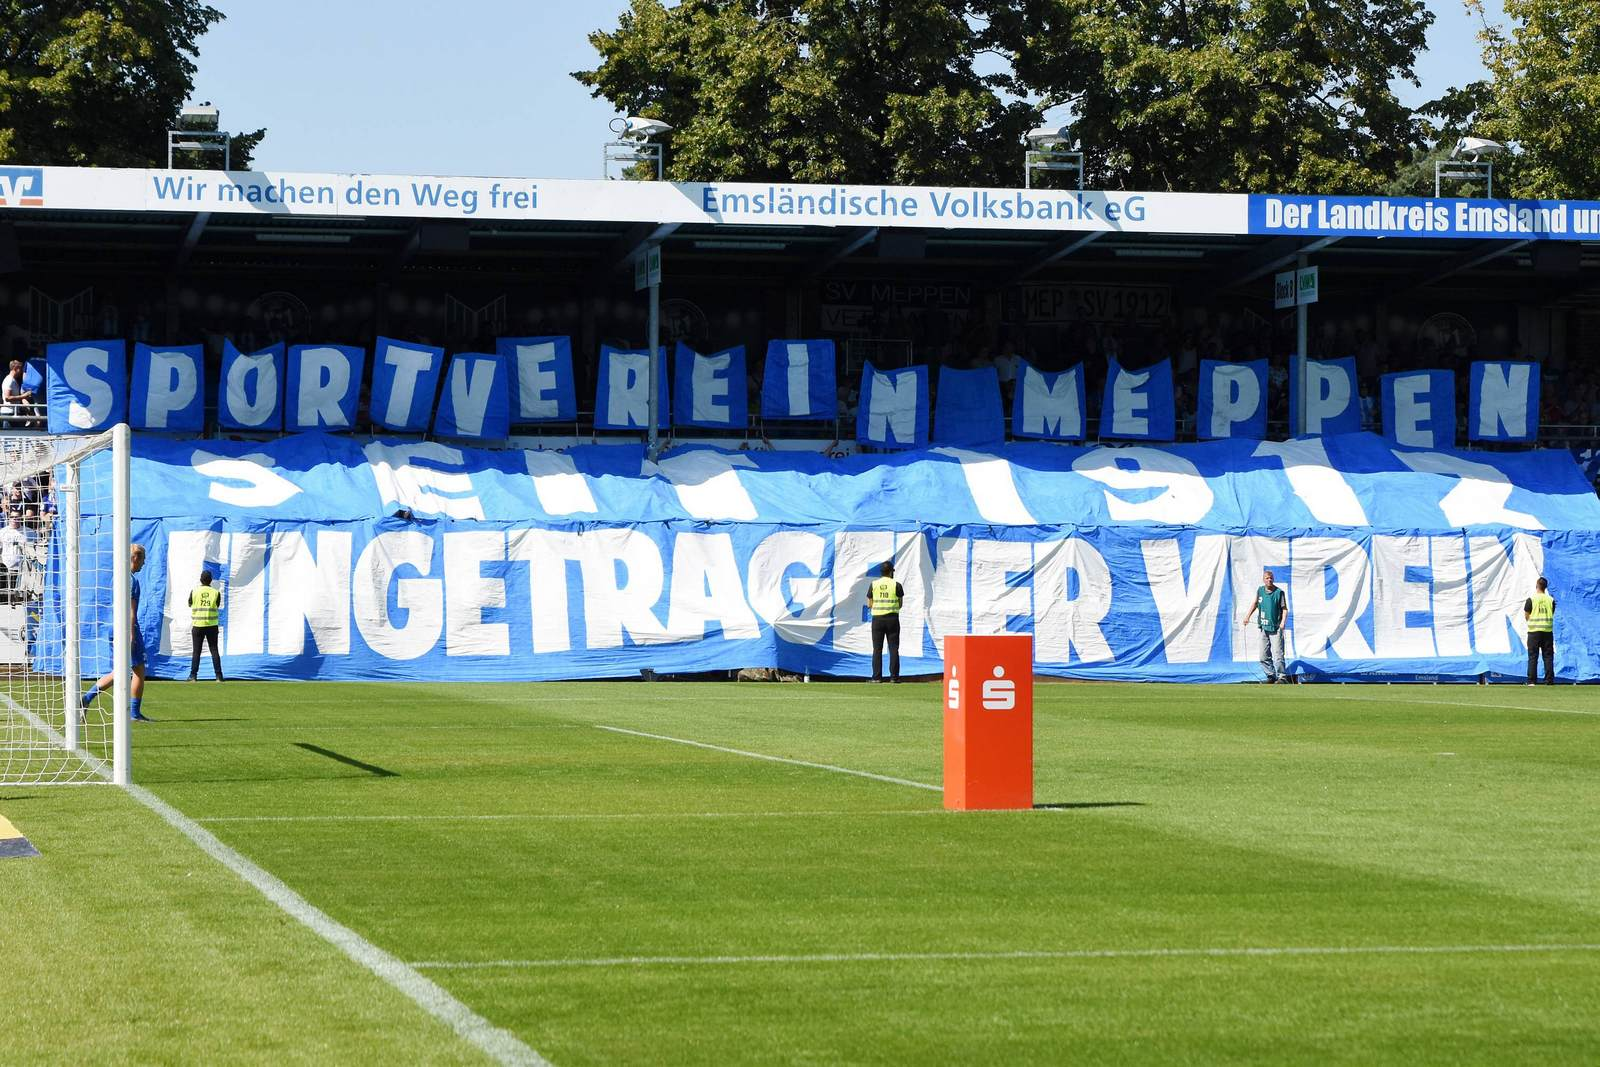 Choreo der SV Meppen Fans